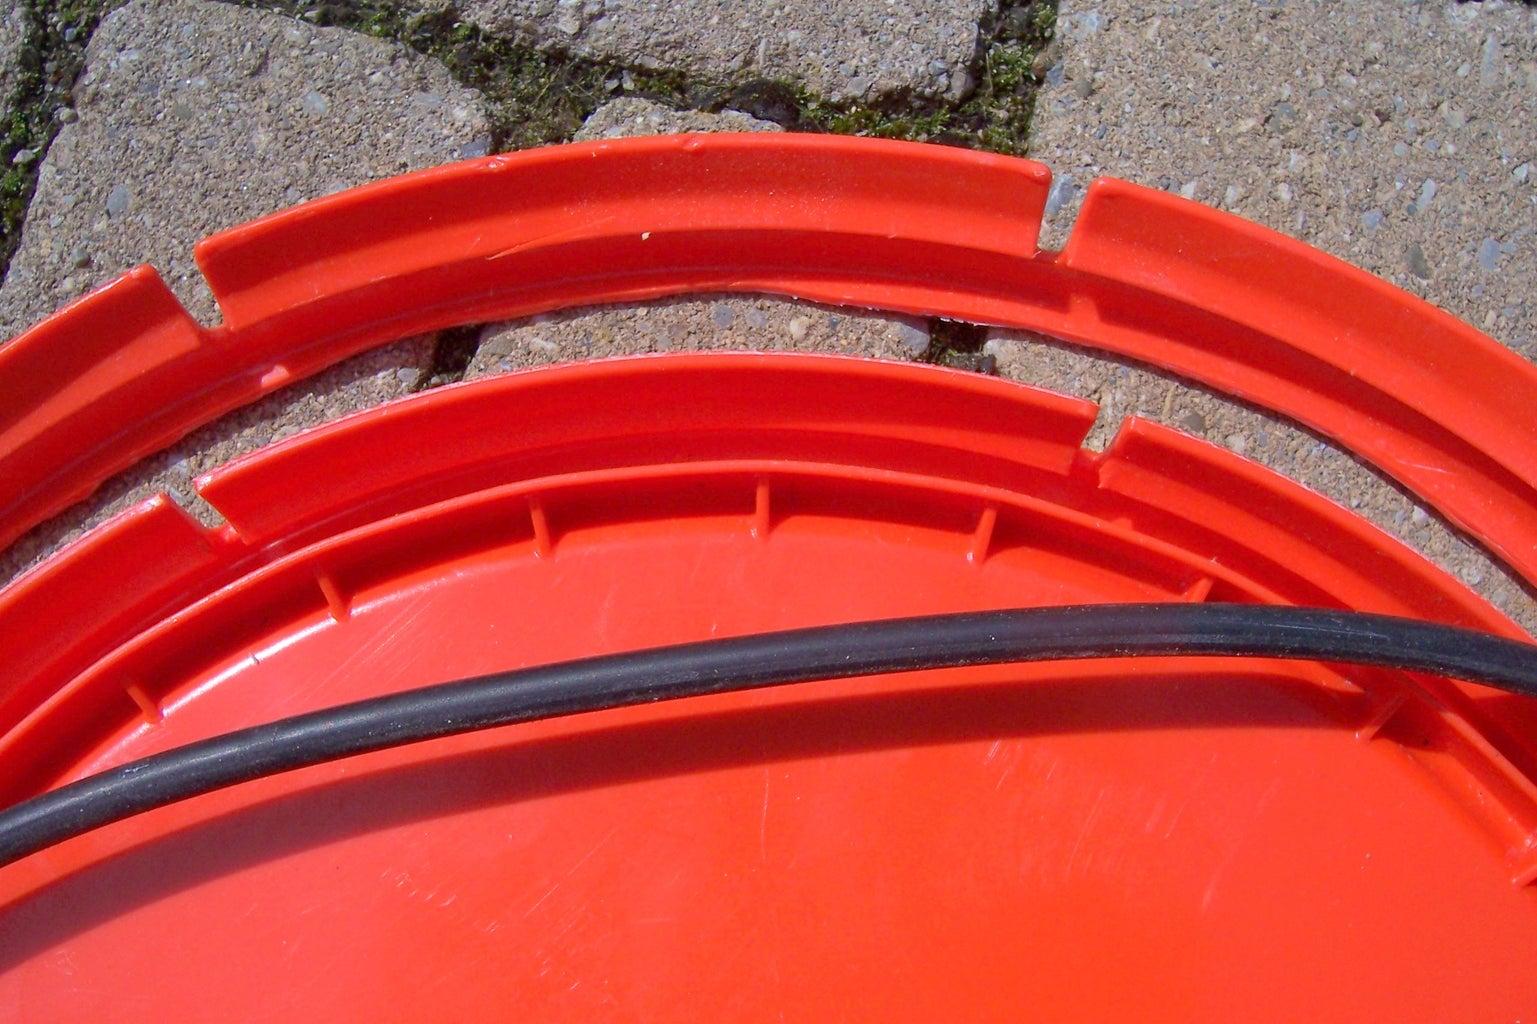 Basin Construction - the Bottom